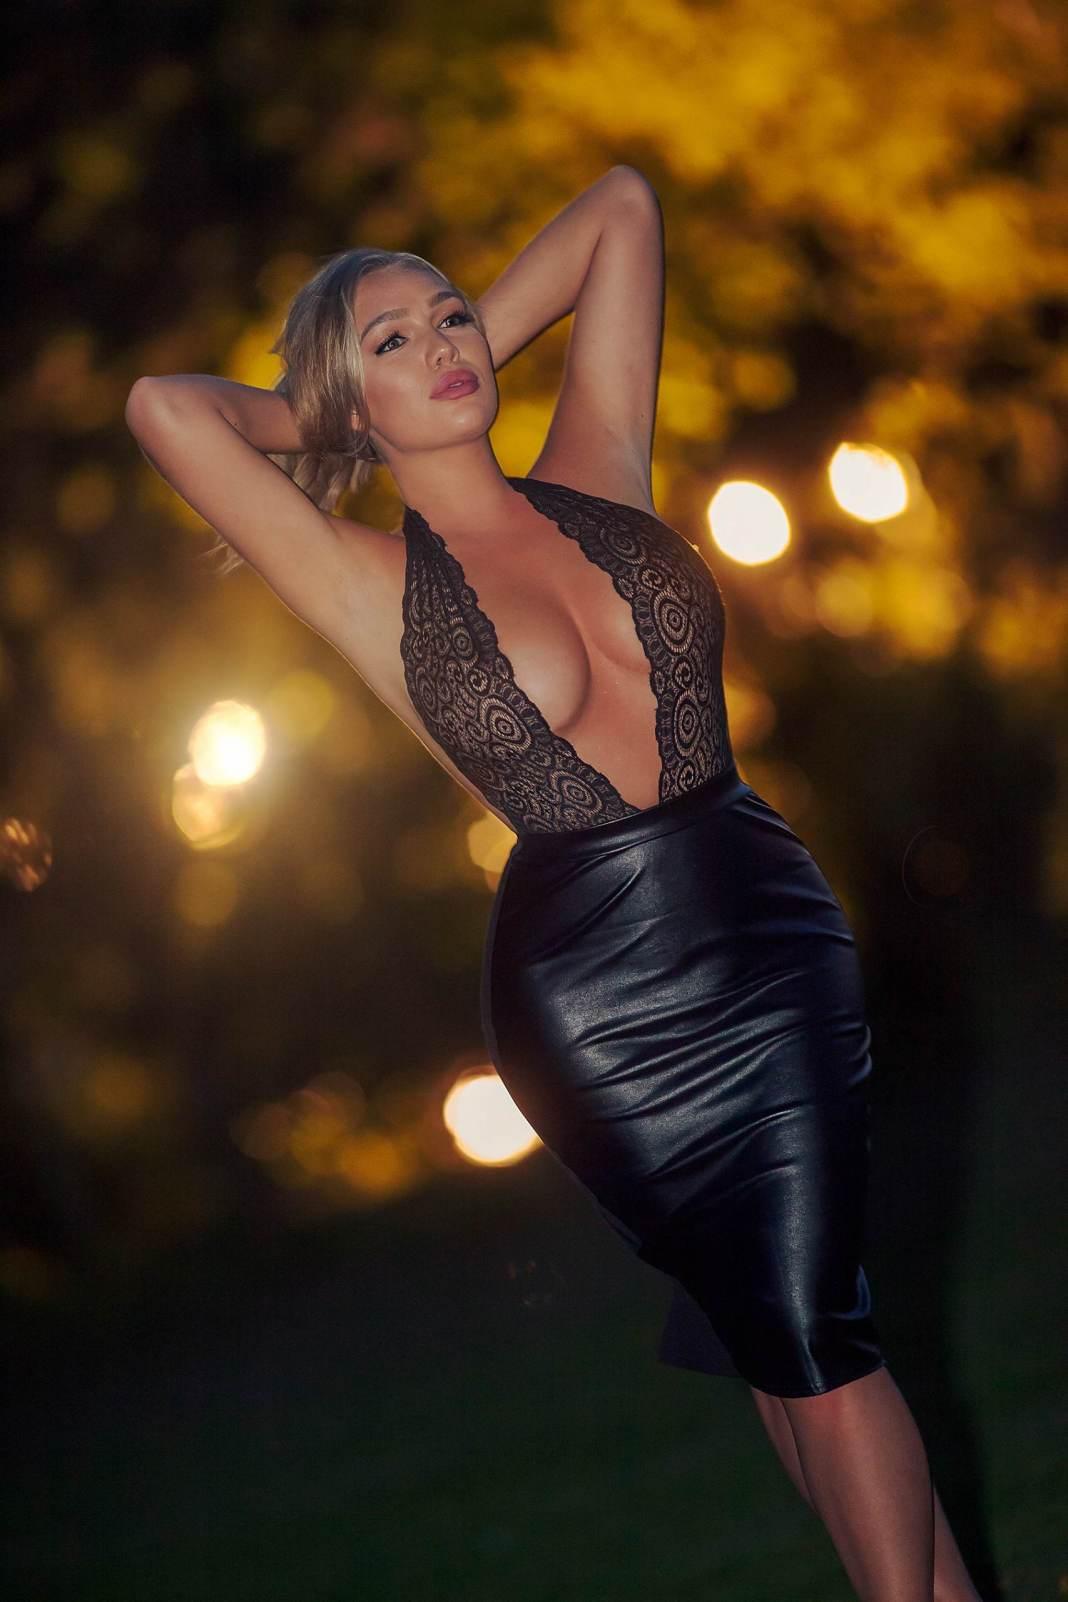 TALLYTA_SHOOT busty blonde